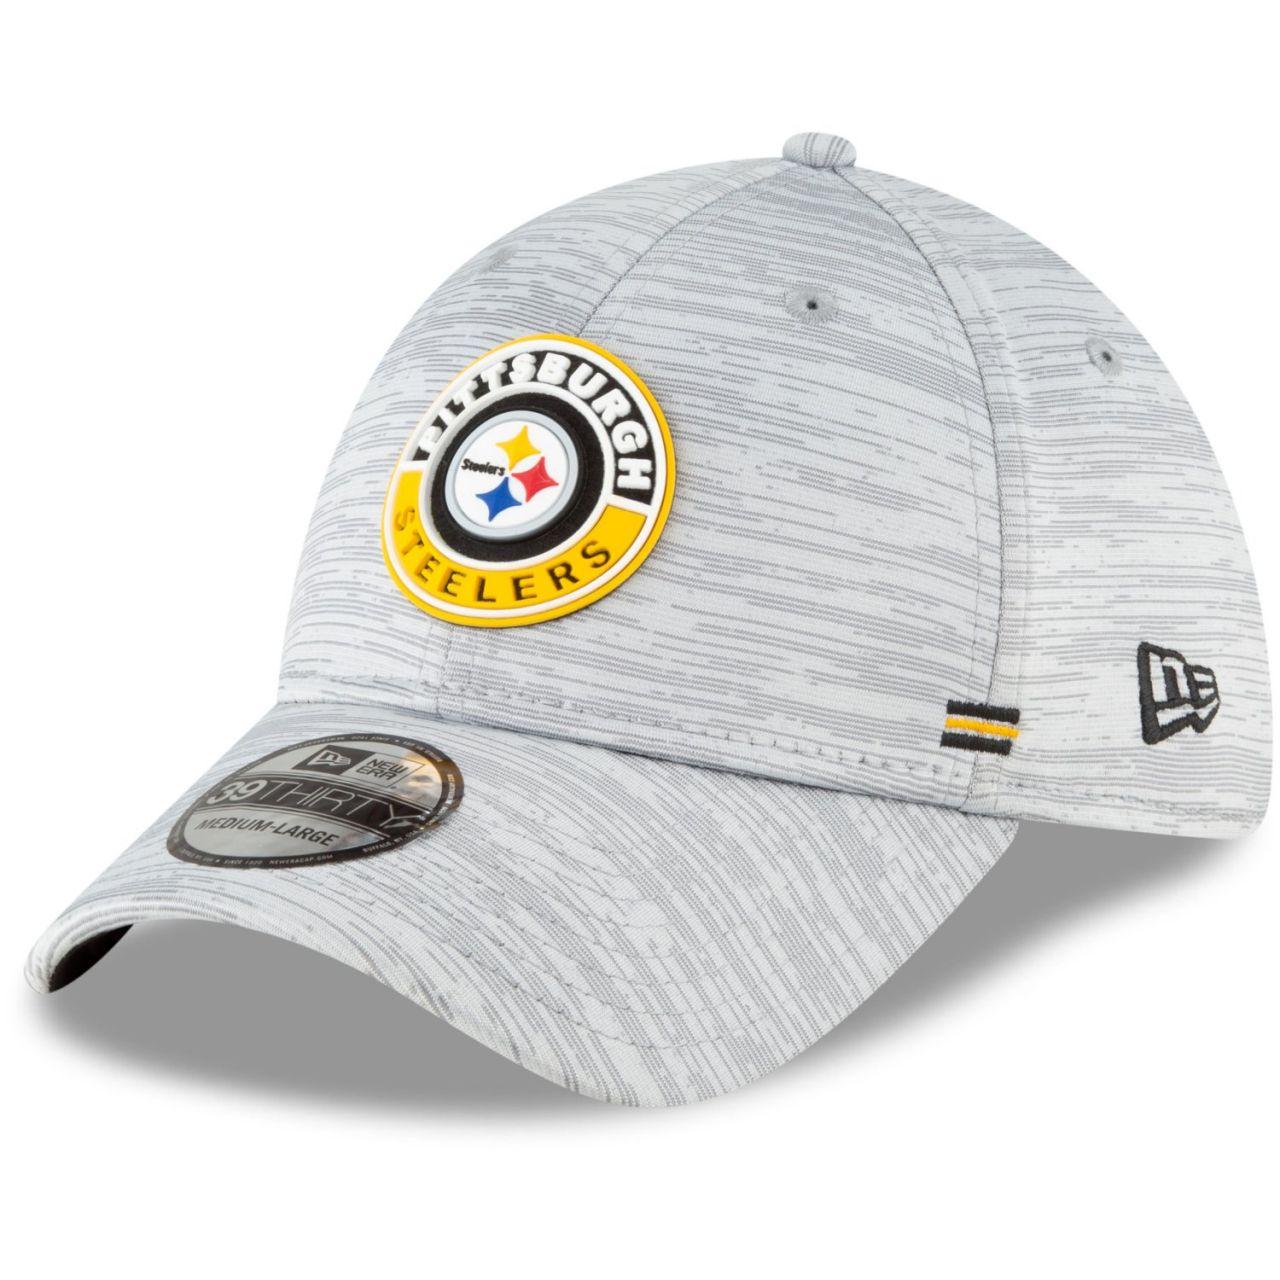 amfoo - New Era 39Thirty Cap - SIDELINE 2020 Pittsburgh Steelers